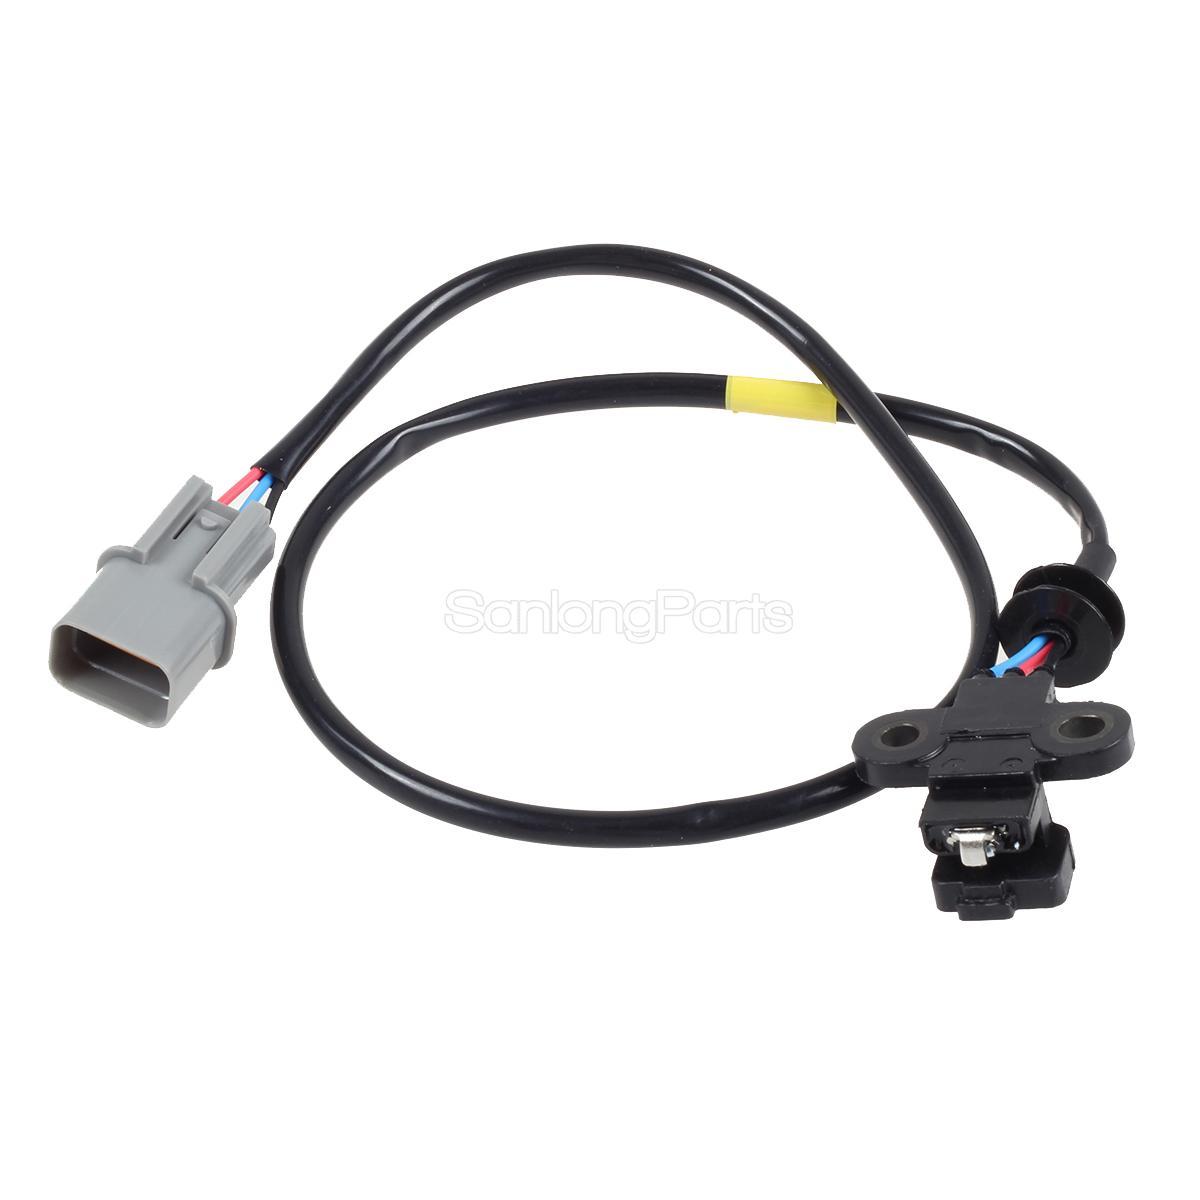 Camshaft Position Sensor Pc96 For 1994 2004 Mitsubishi Montero 35l O2 Wiring Diagram 30l V6